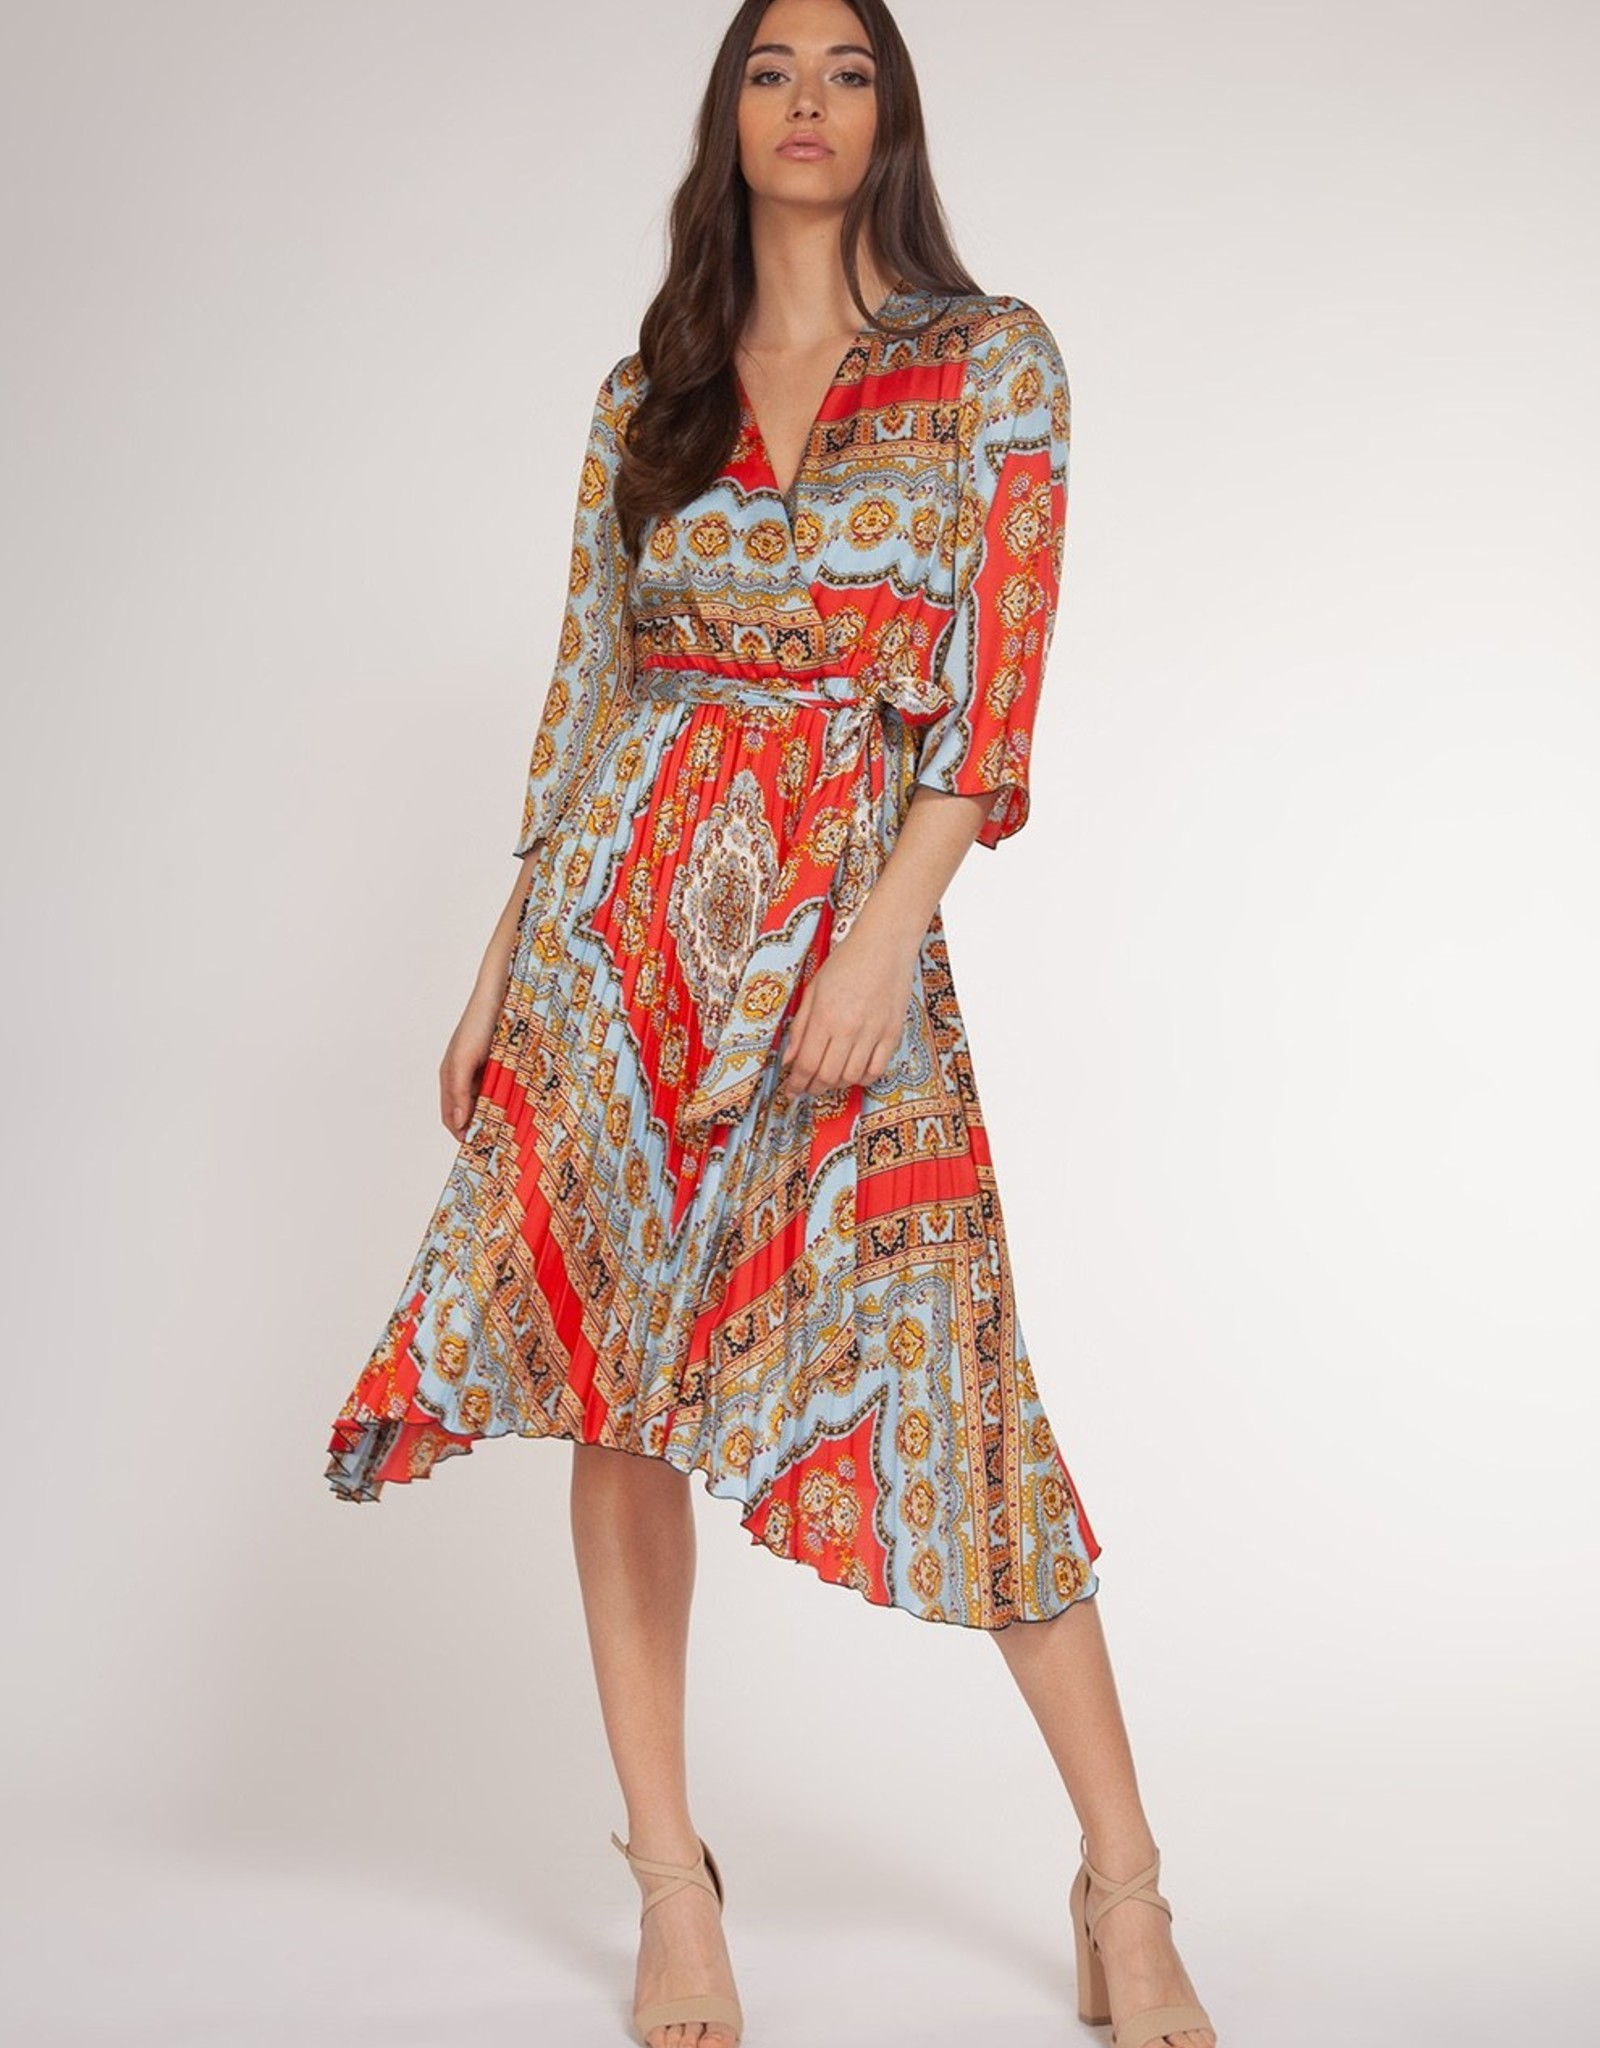 Chain Print Pleated Skirt Dress